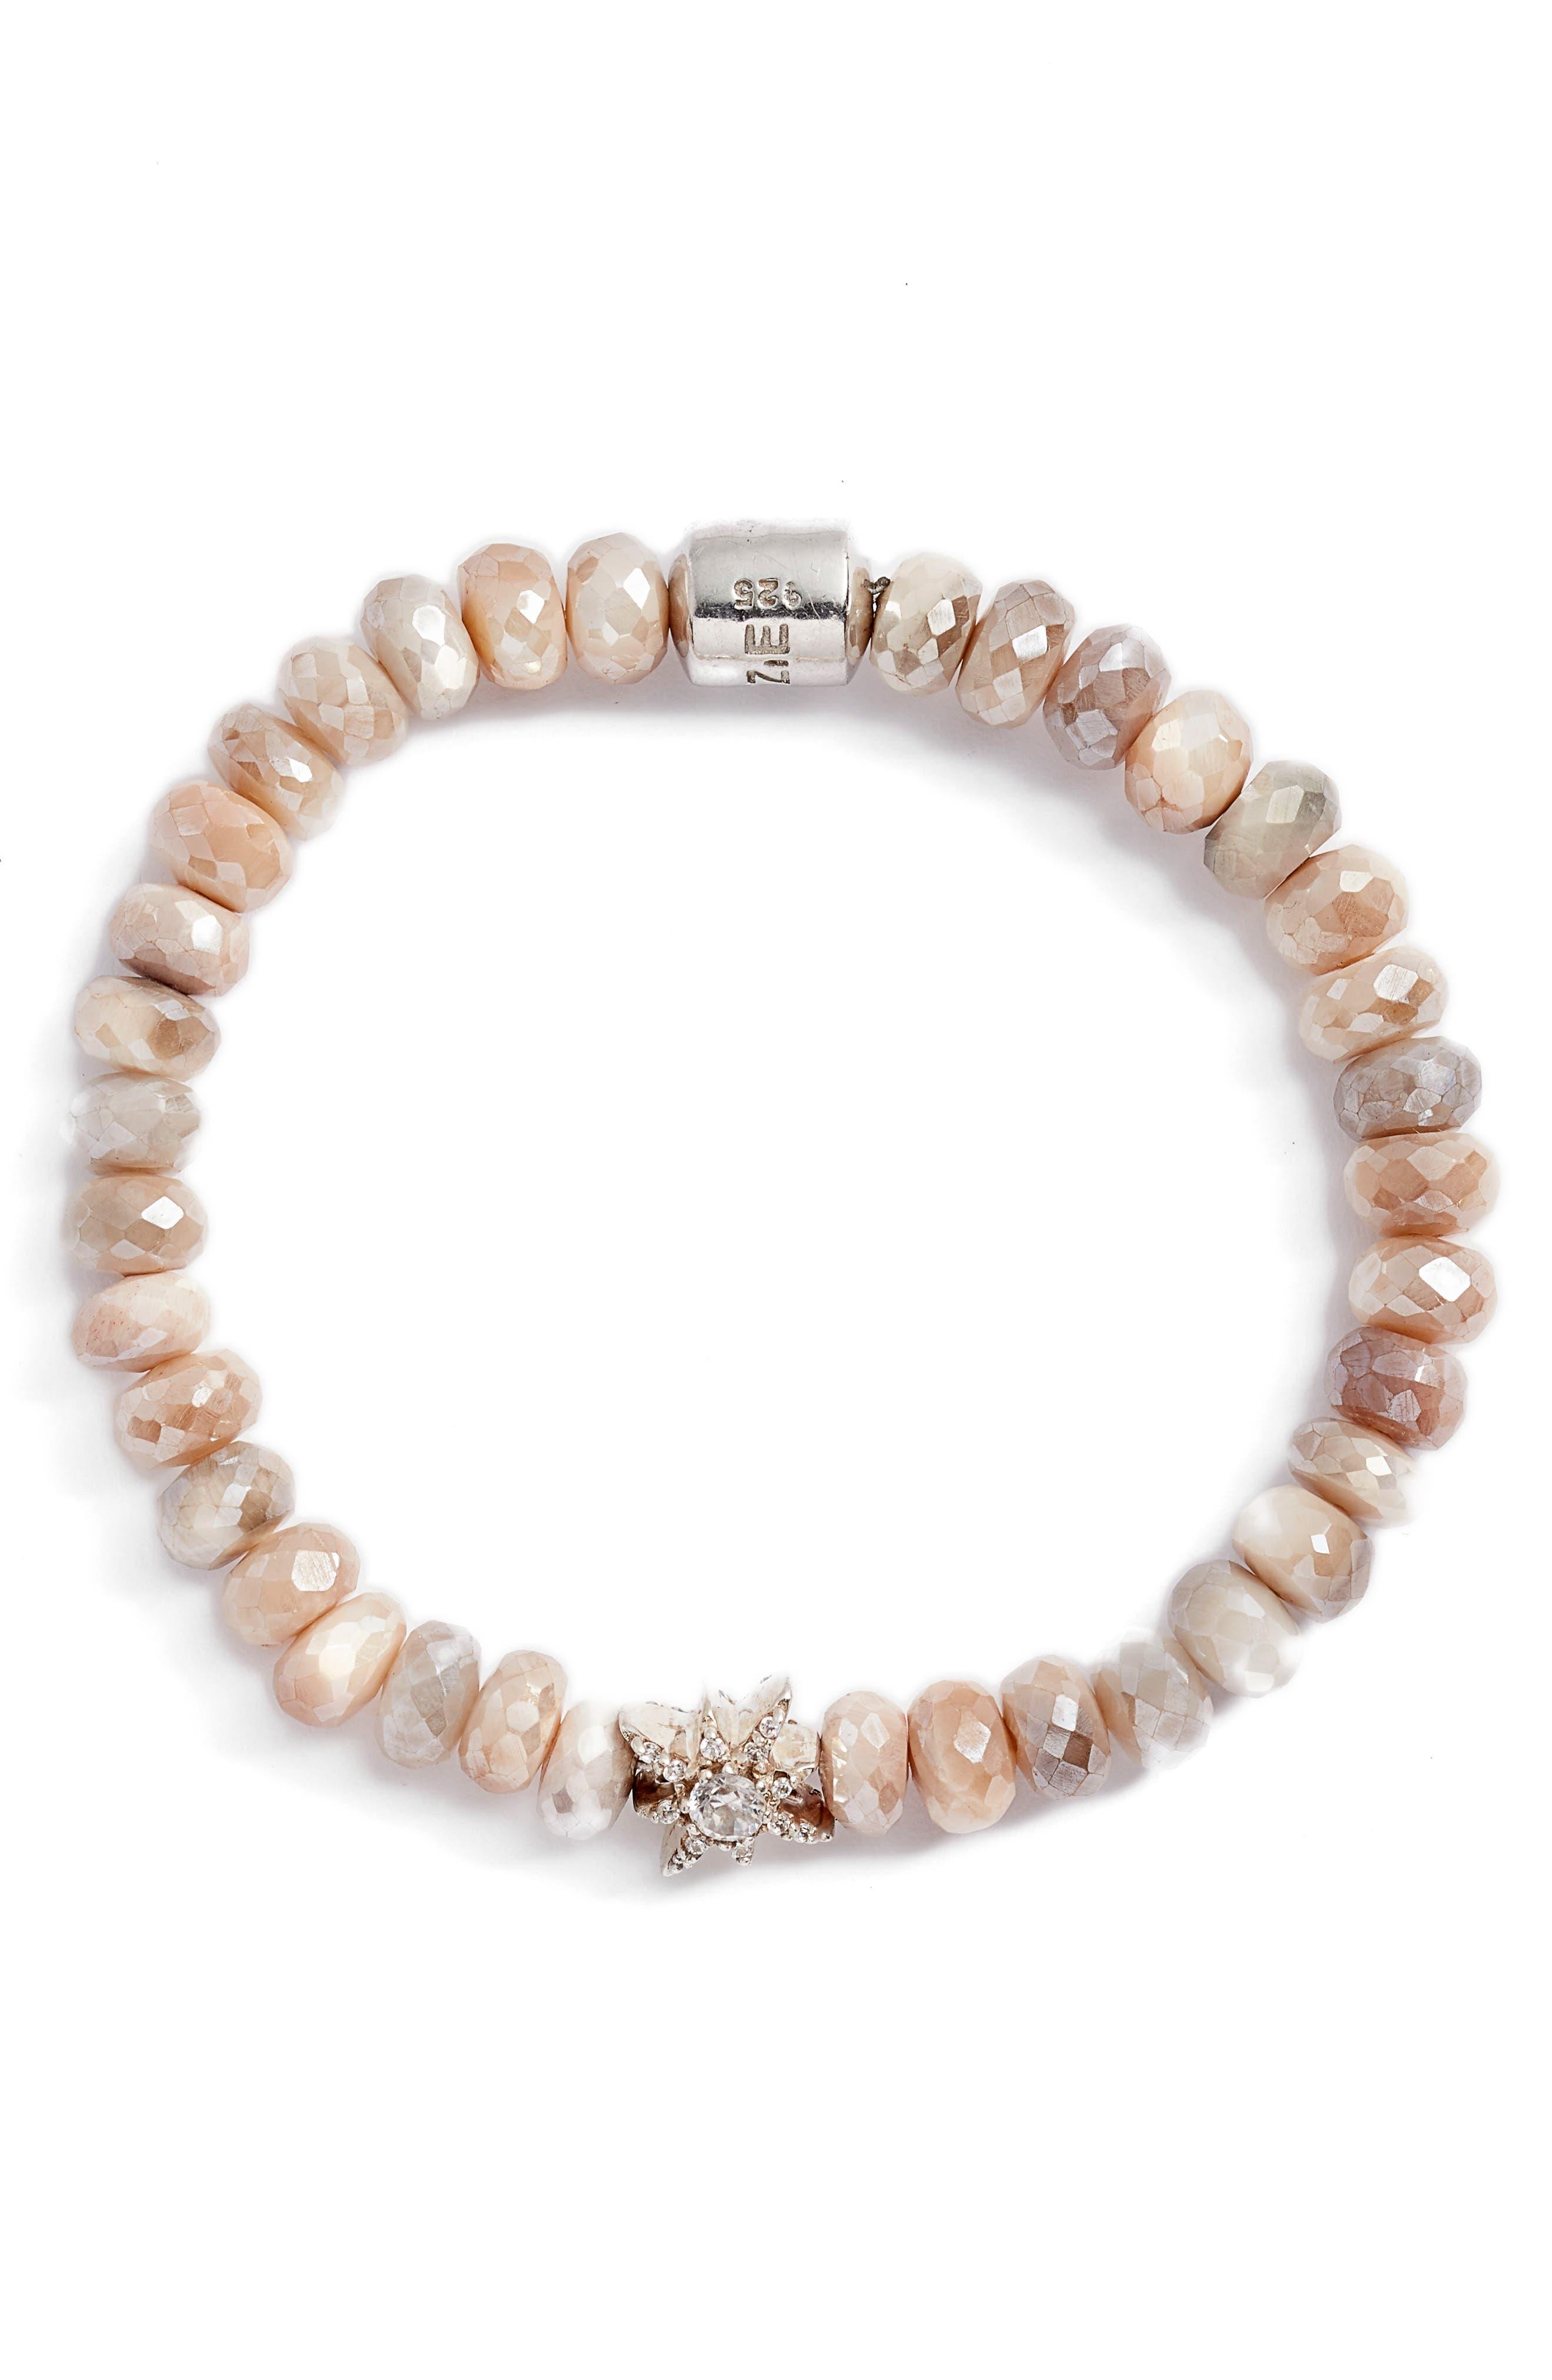 Boheme Star Moonstone Bead Bracelet